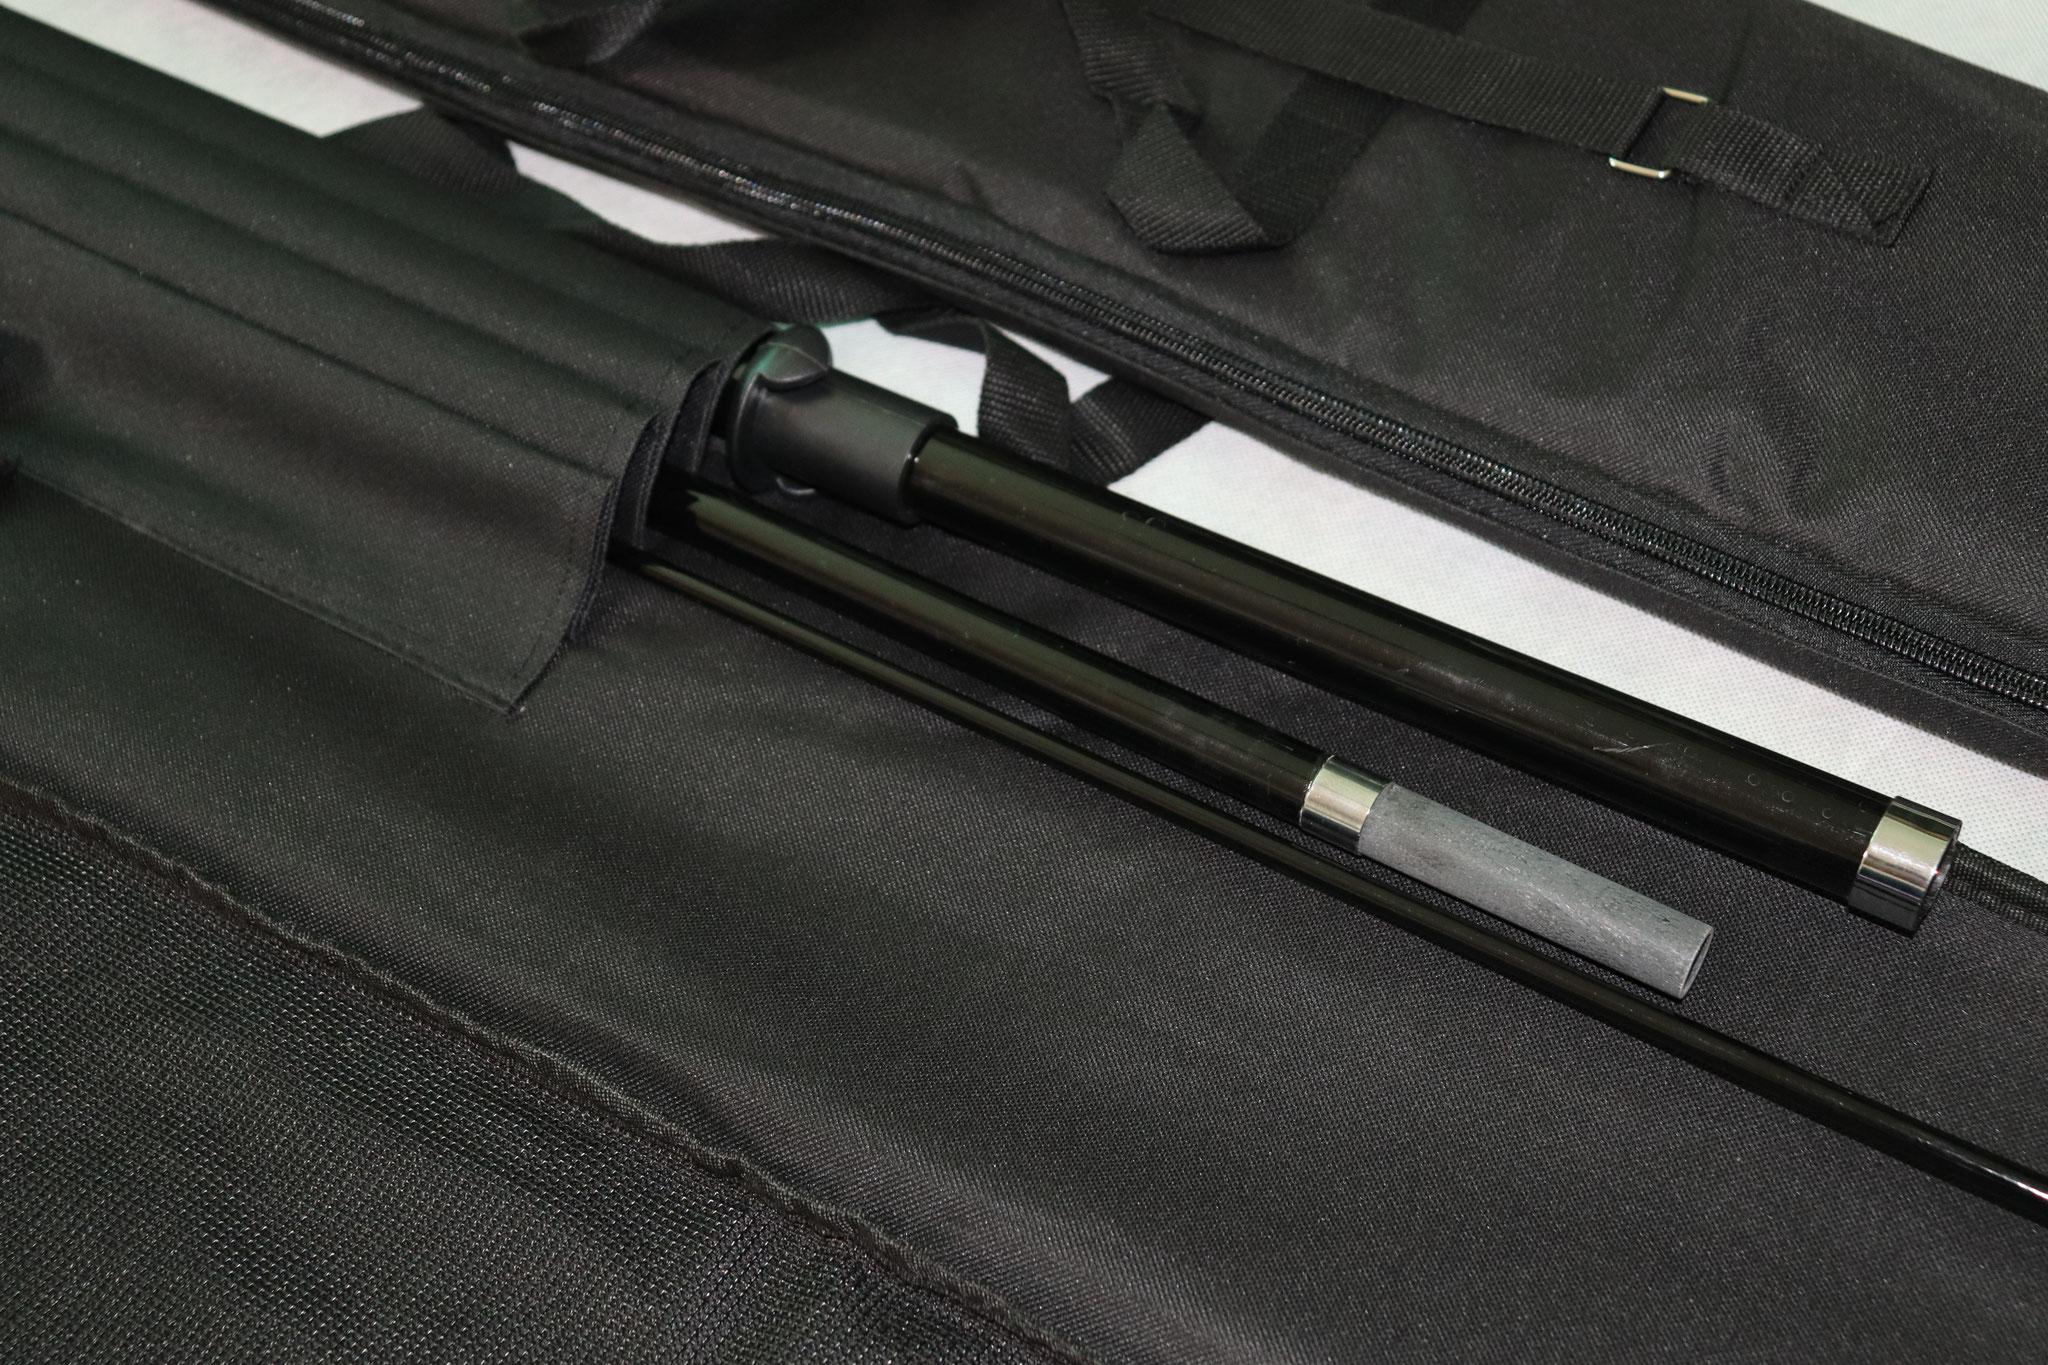 Fibrelight Printed Event Flags - Premium Pole Storage Sleeves